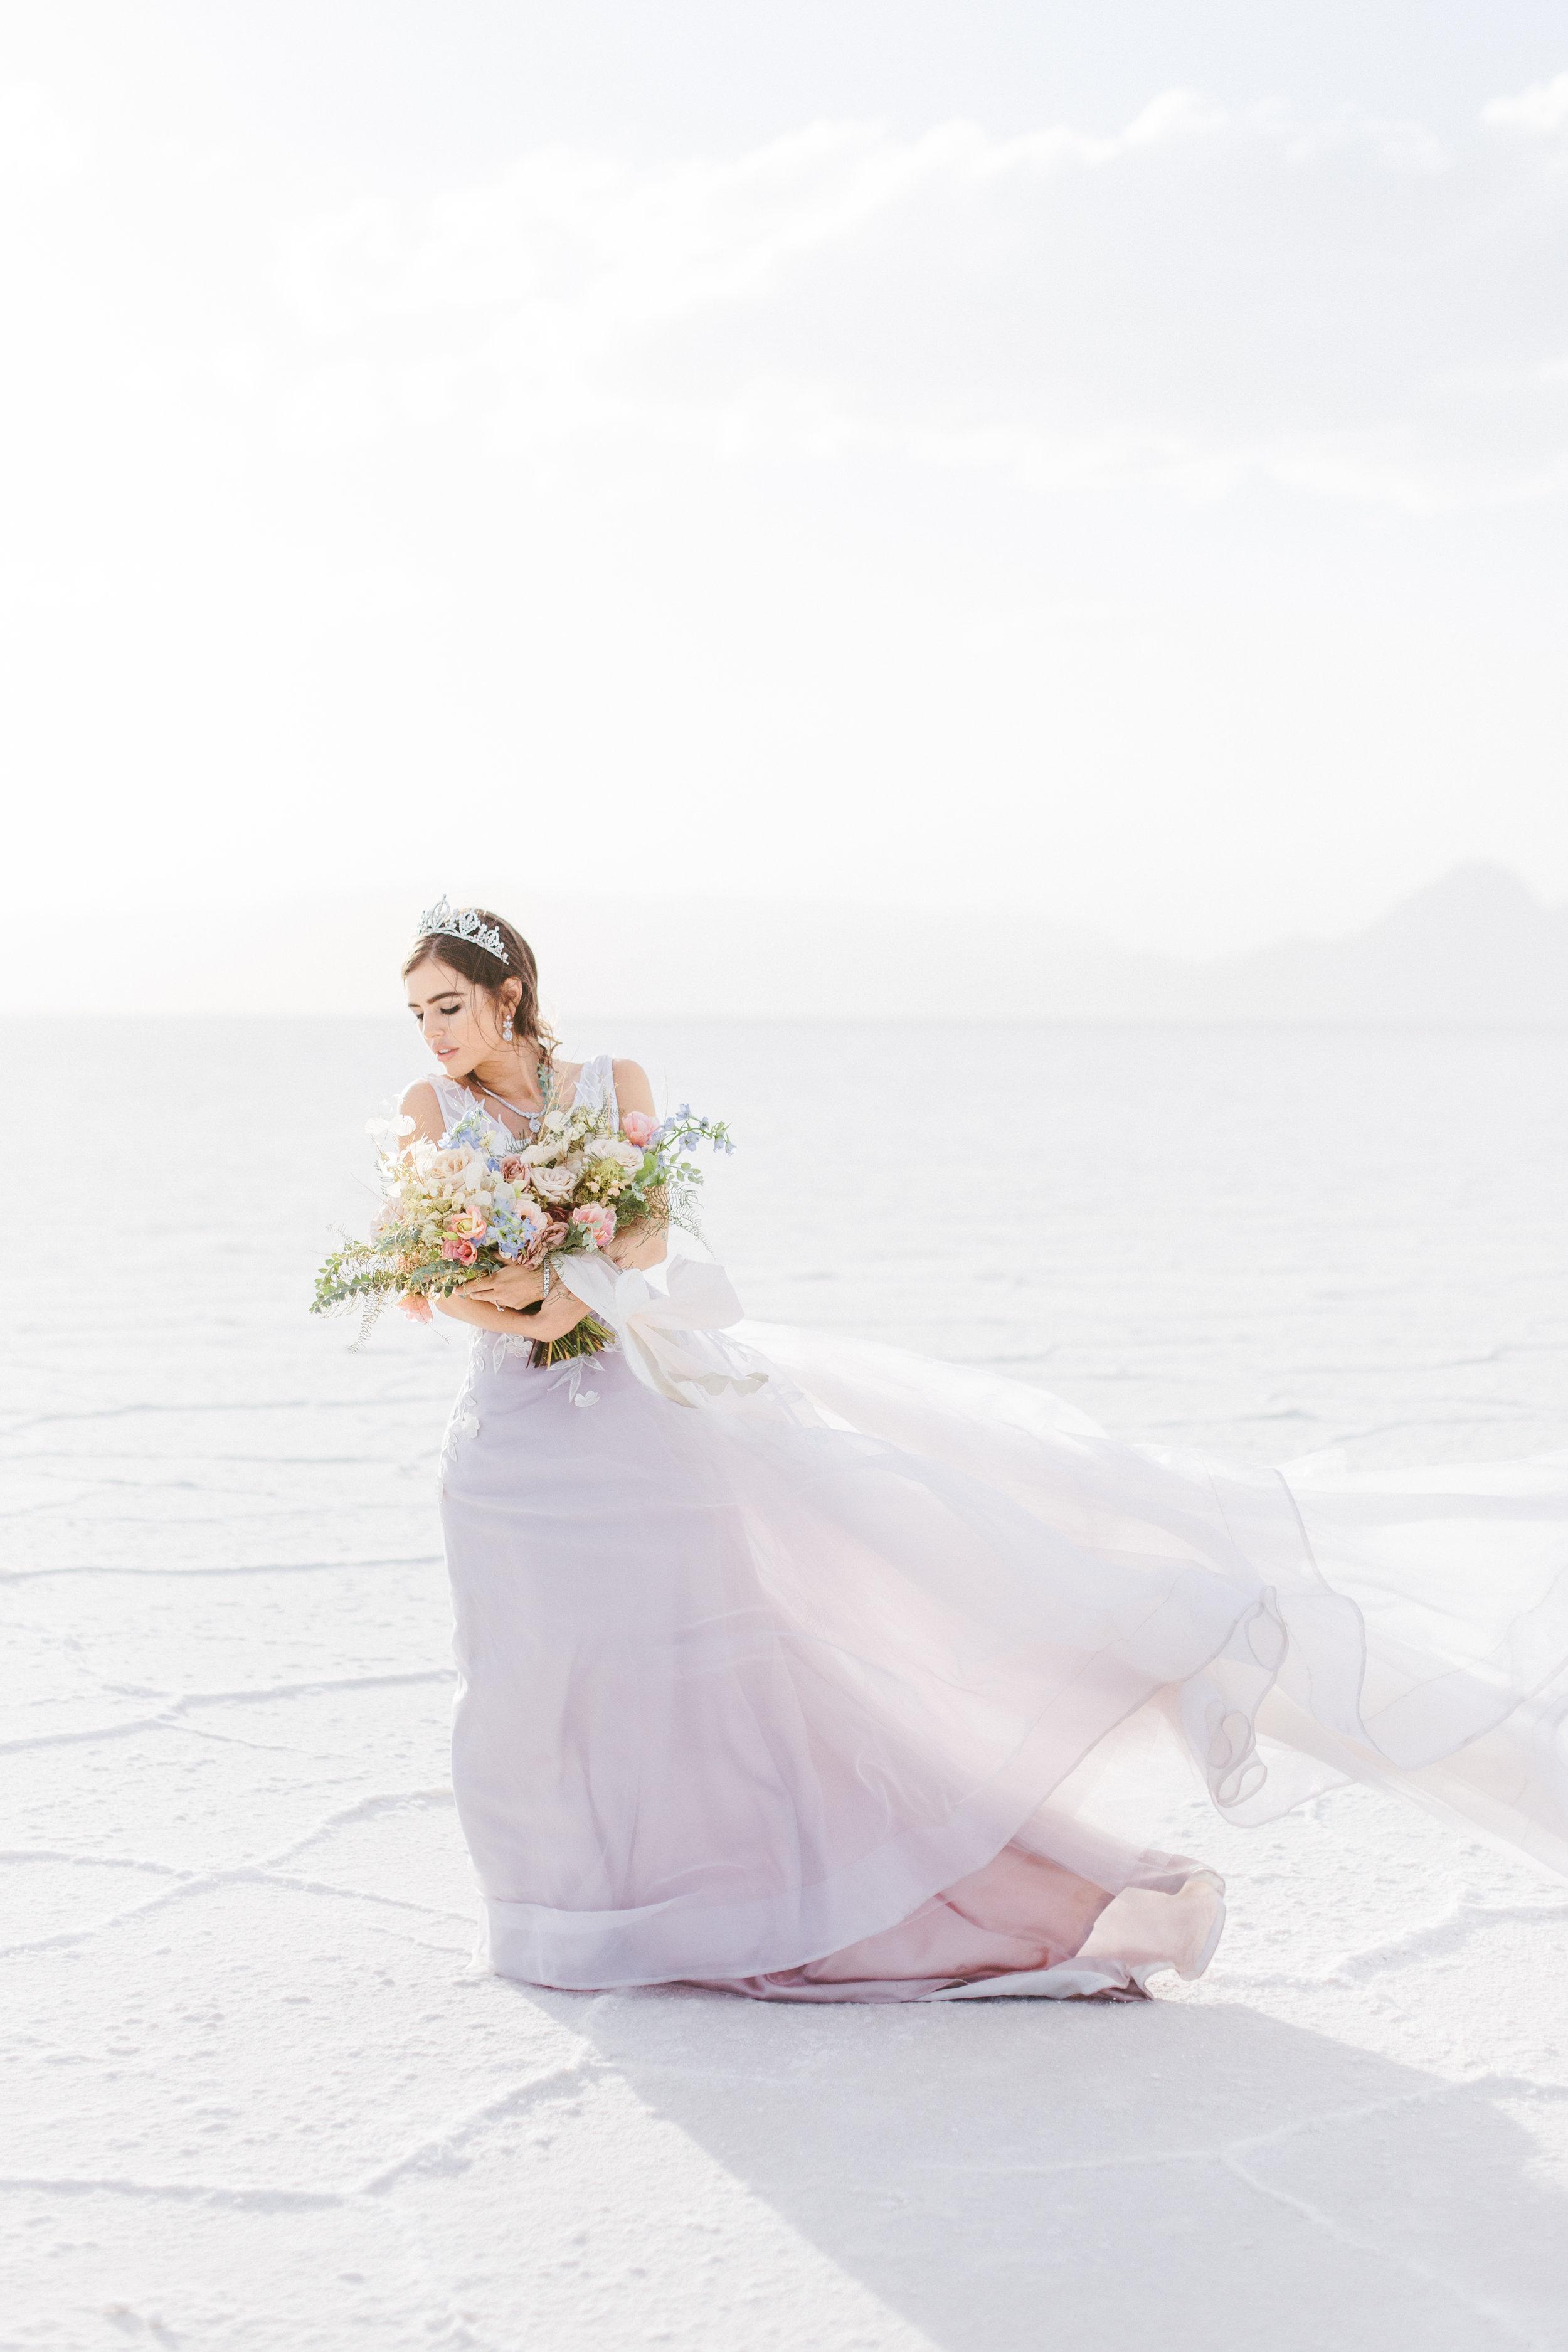 modern minimalist wedding bridal look for wedding photoshoot